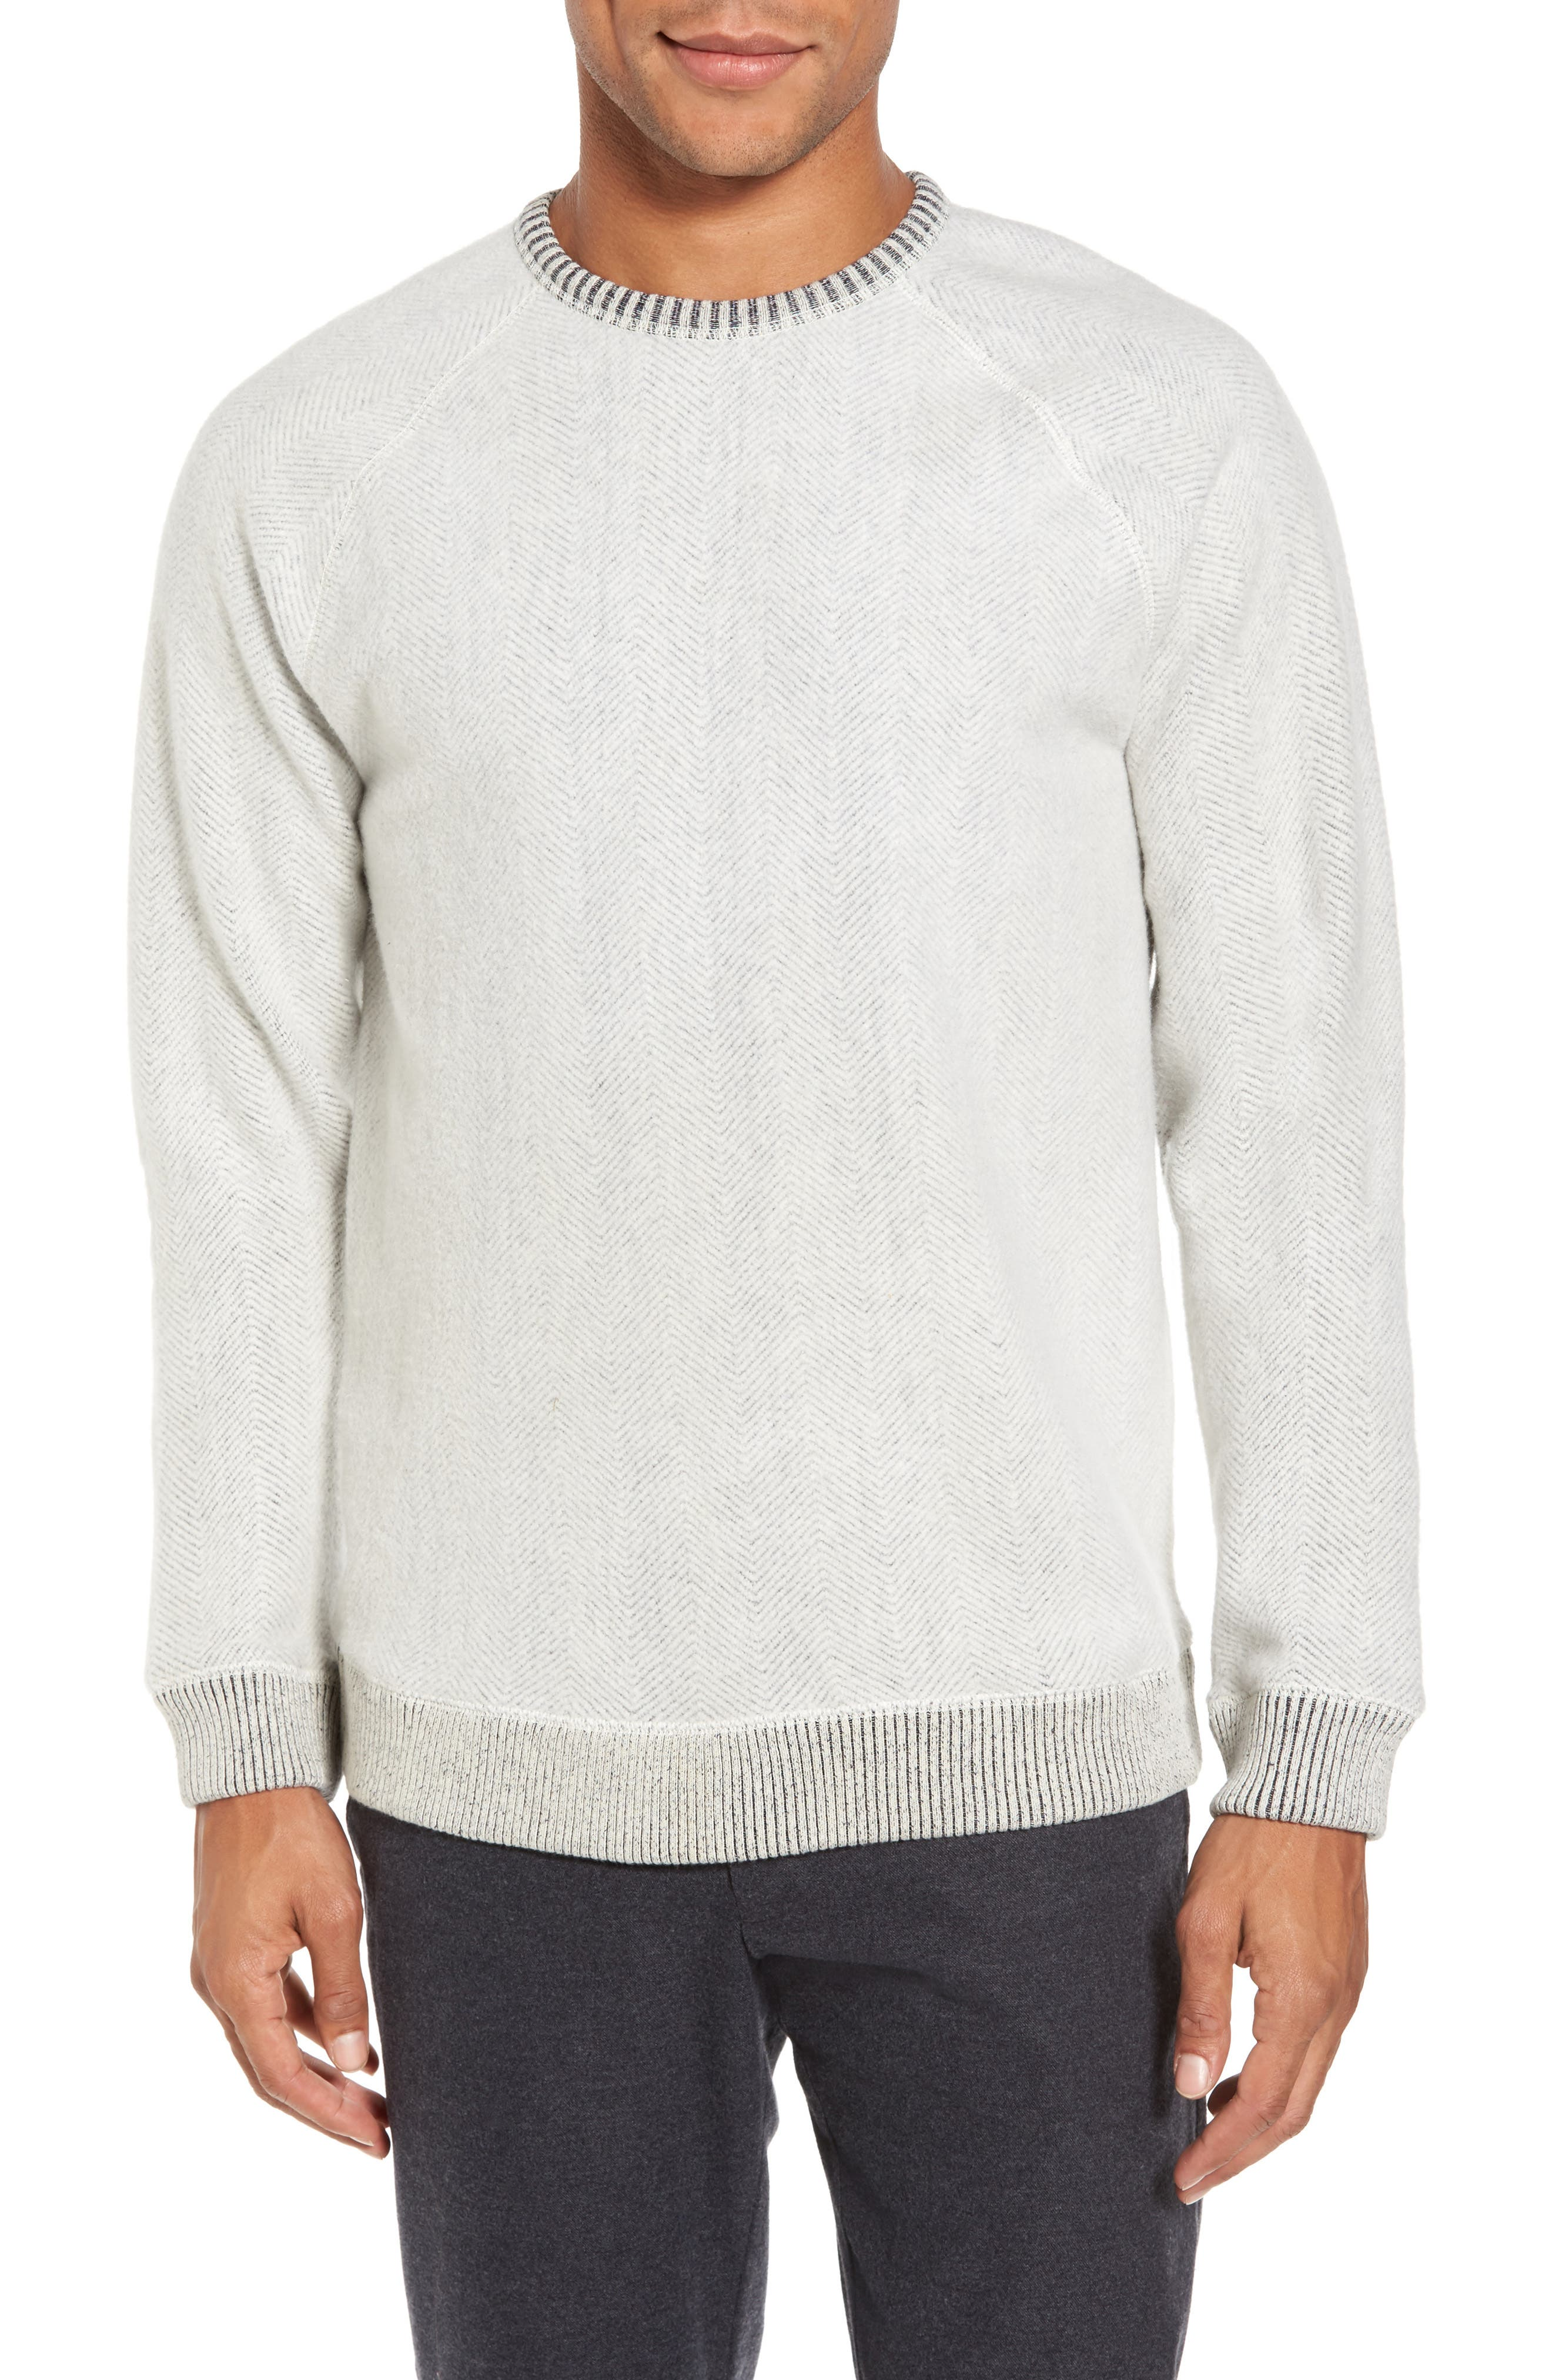 Brushed Fleece Sweatshirt,                         Main,                         color, Ivory Egret